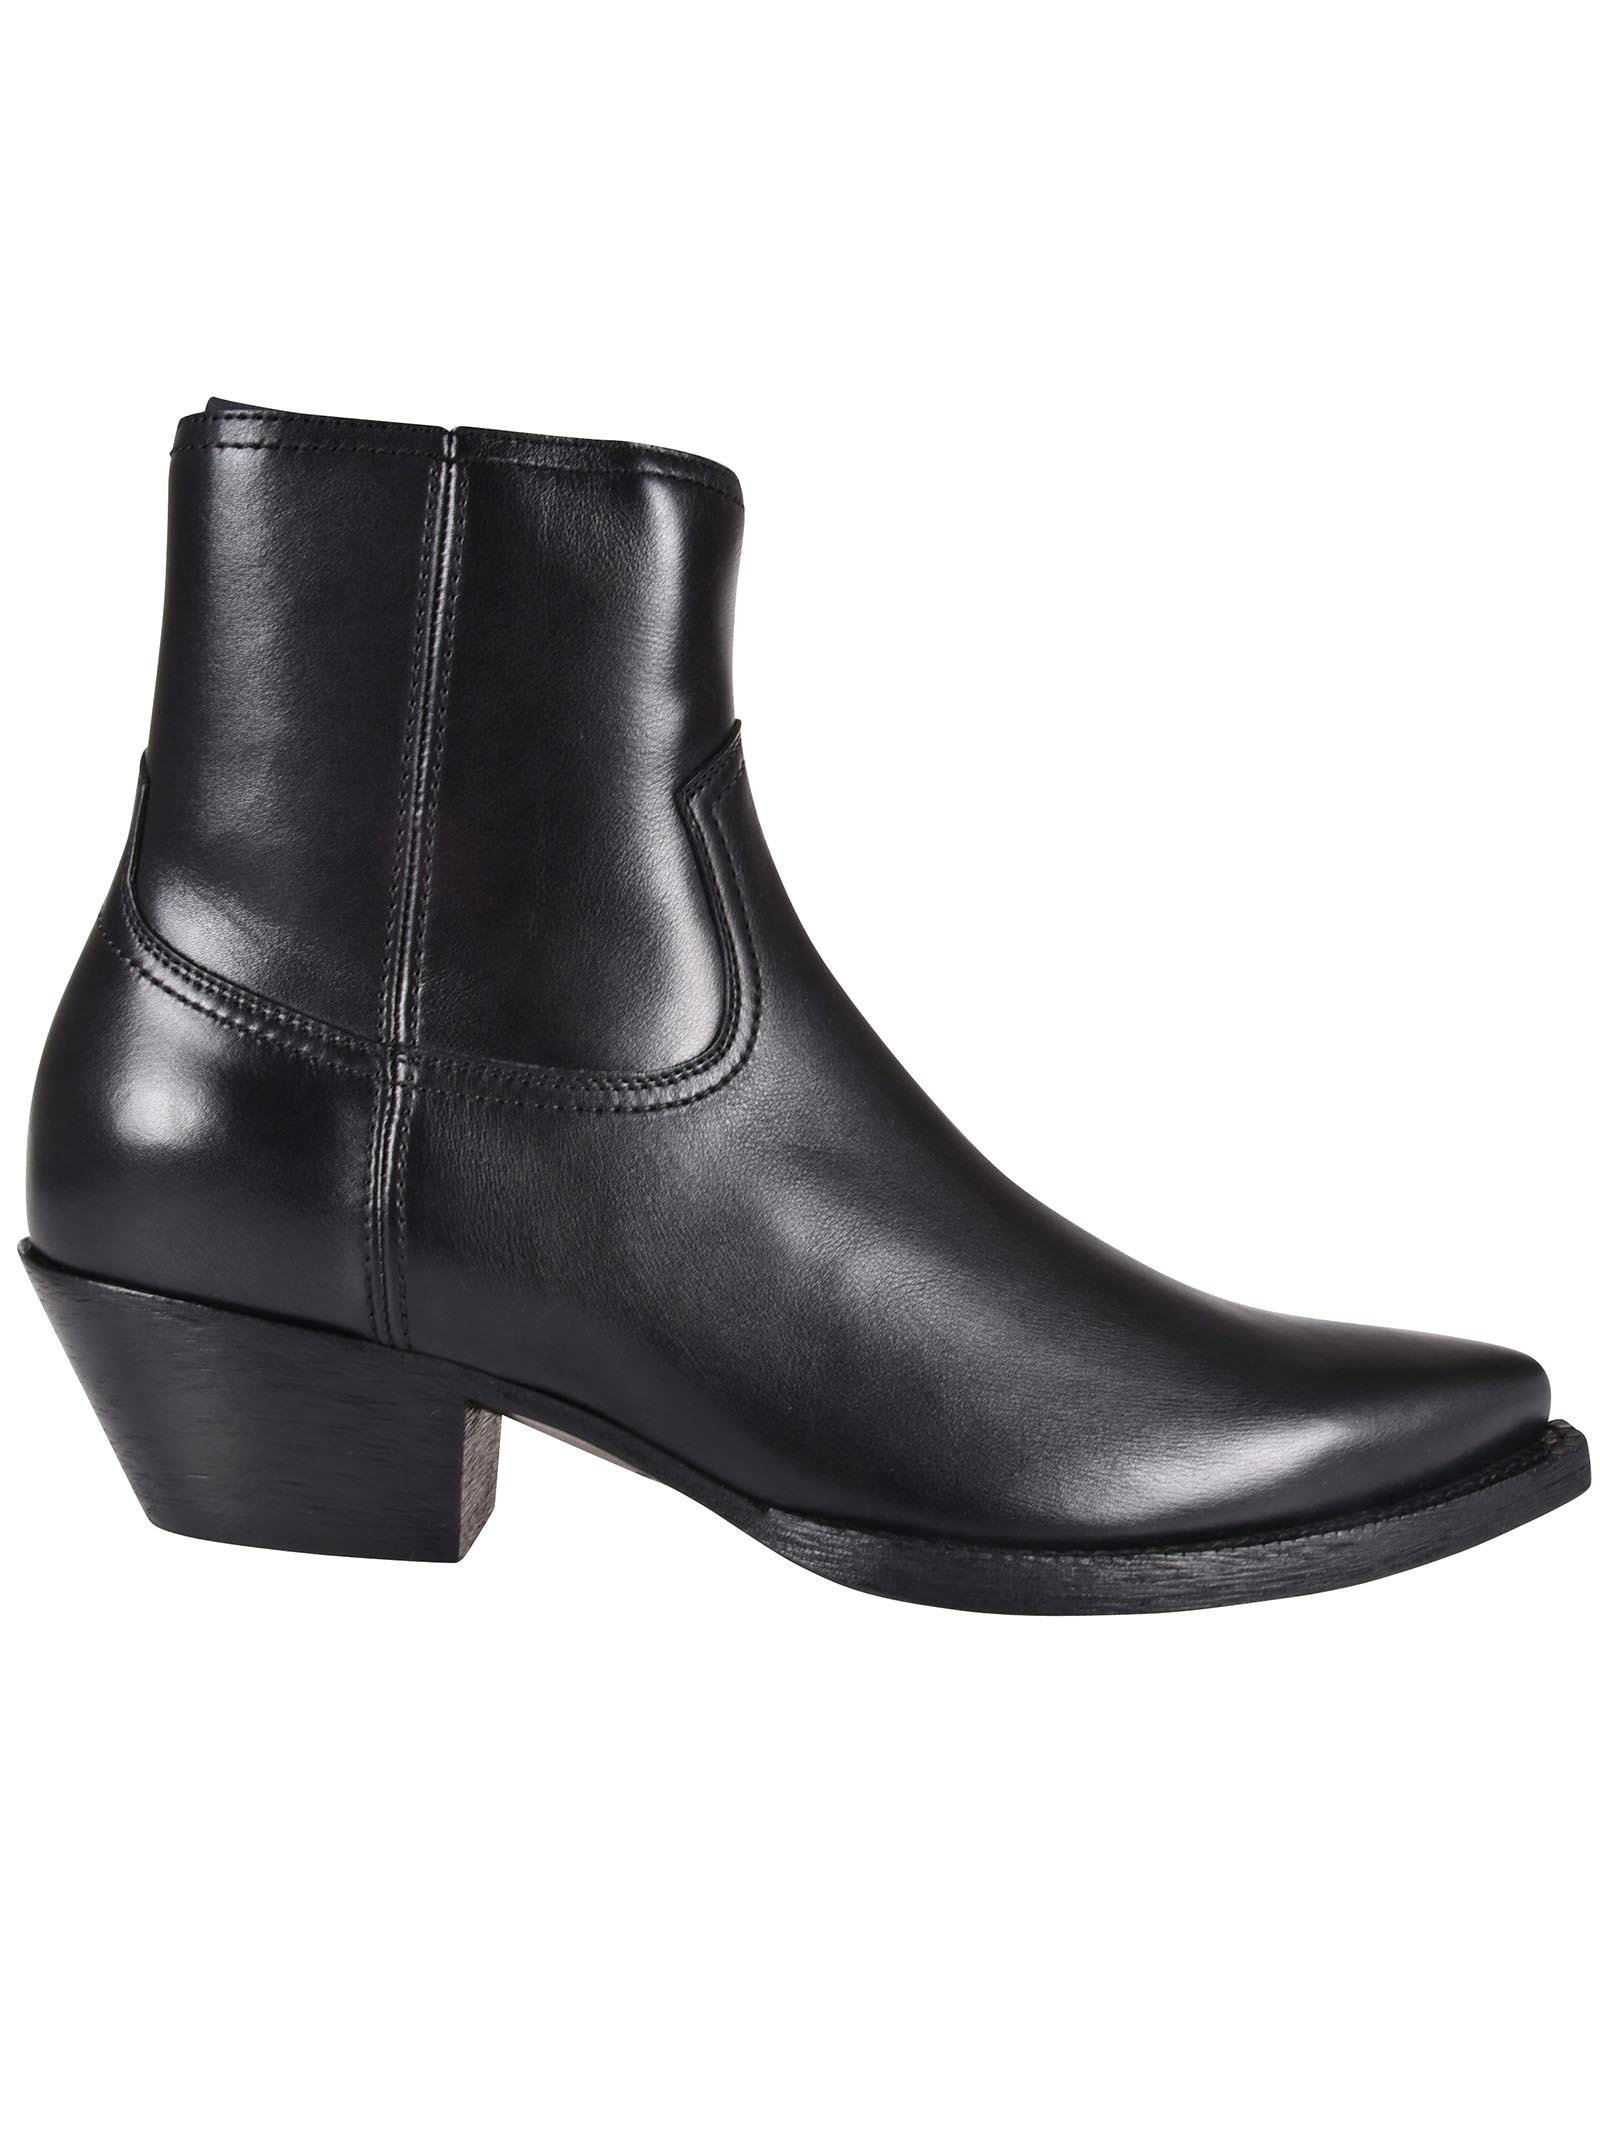 256adb94f33 Saint Laurent Camperos Ankle Boots In Nero | ModeSens